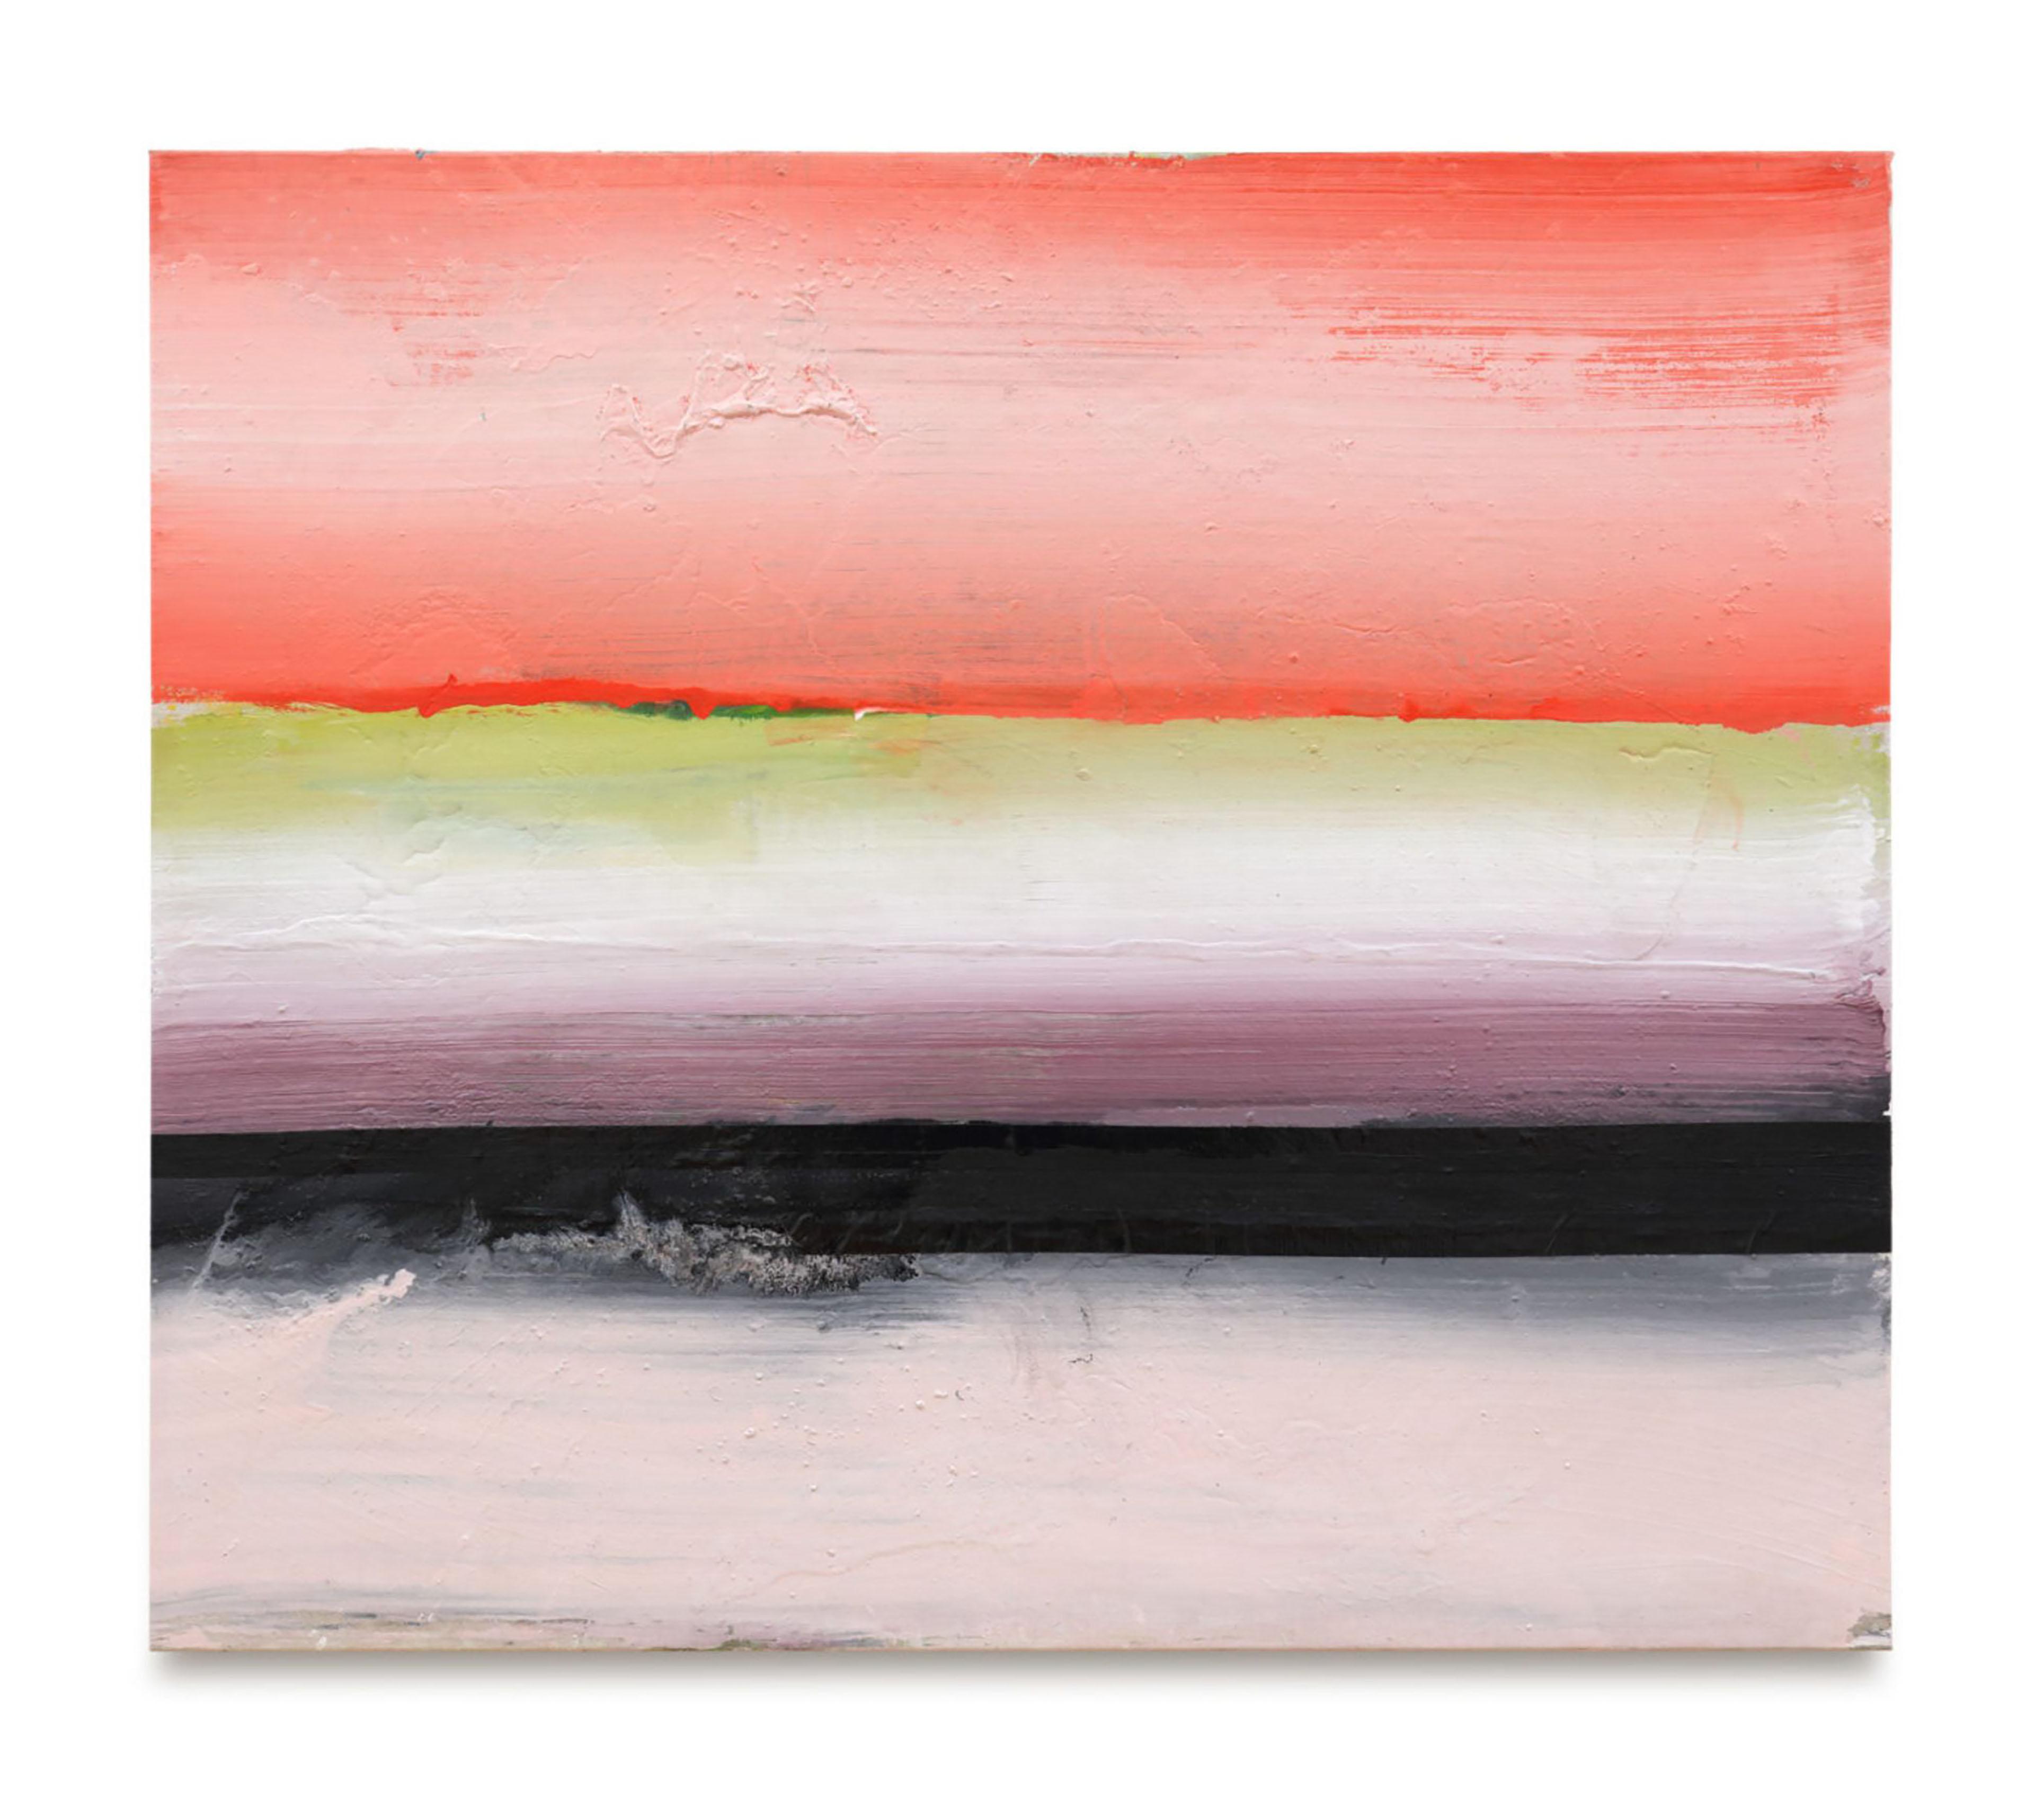 Storied Painter Ed Clark Joins Hauser & Wirth